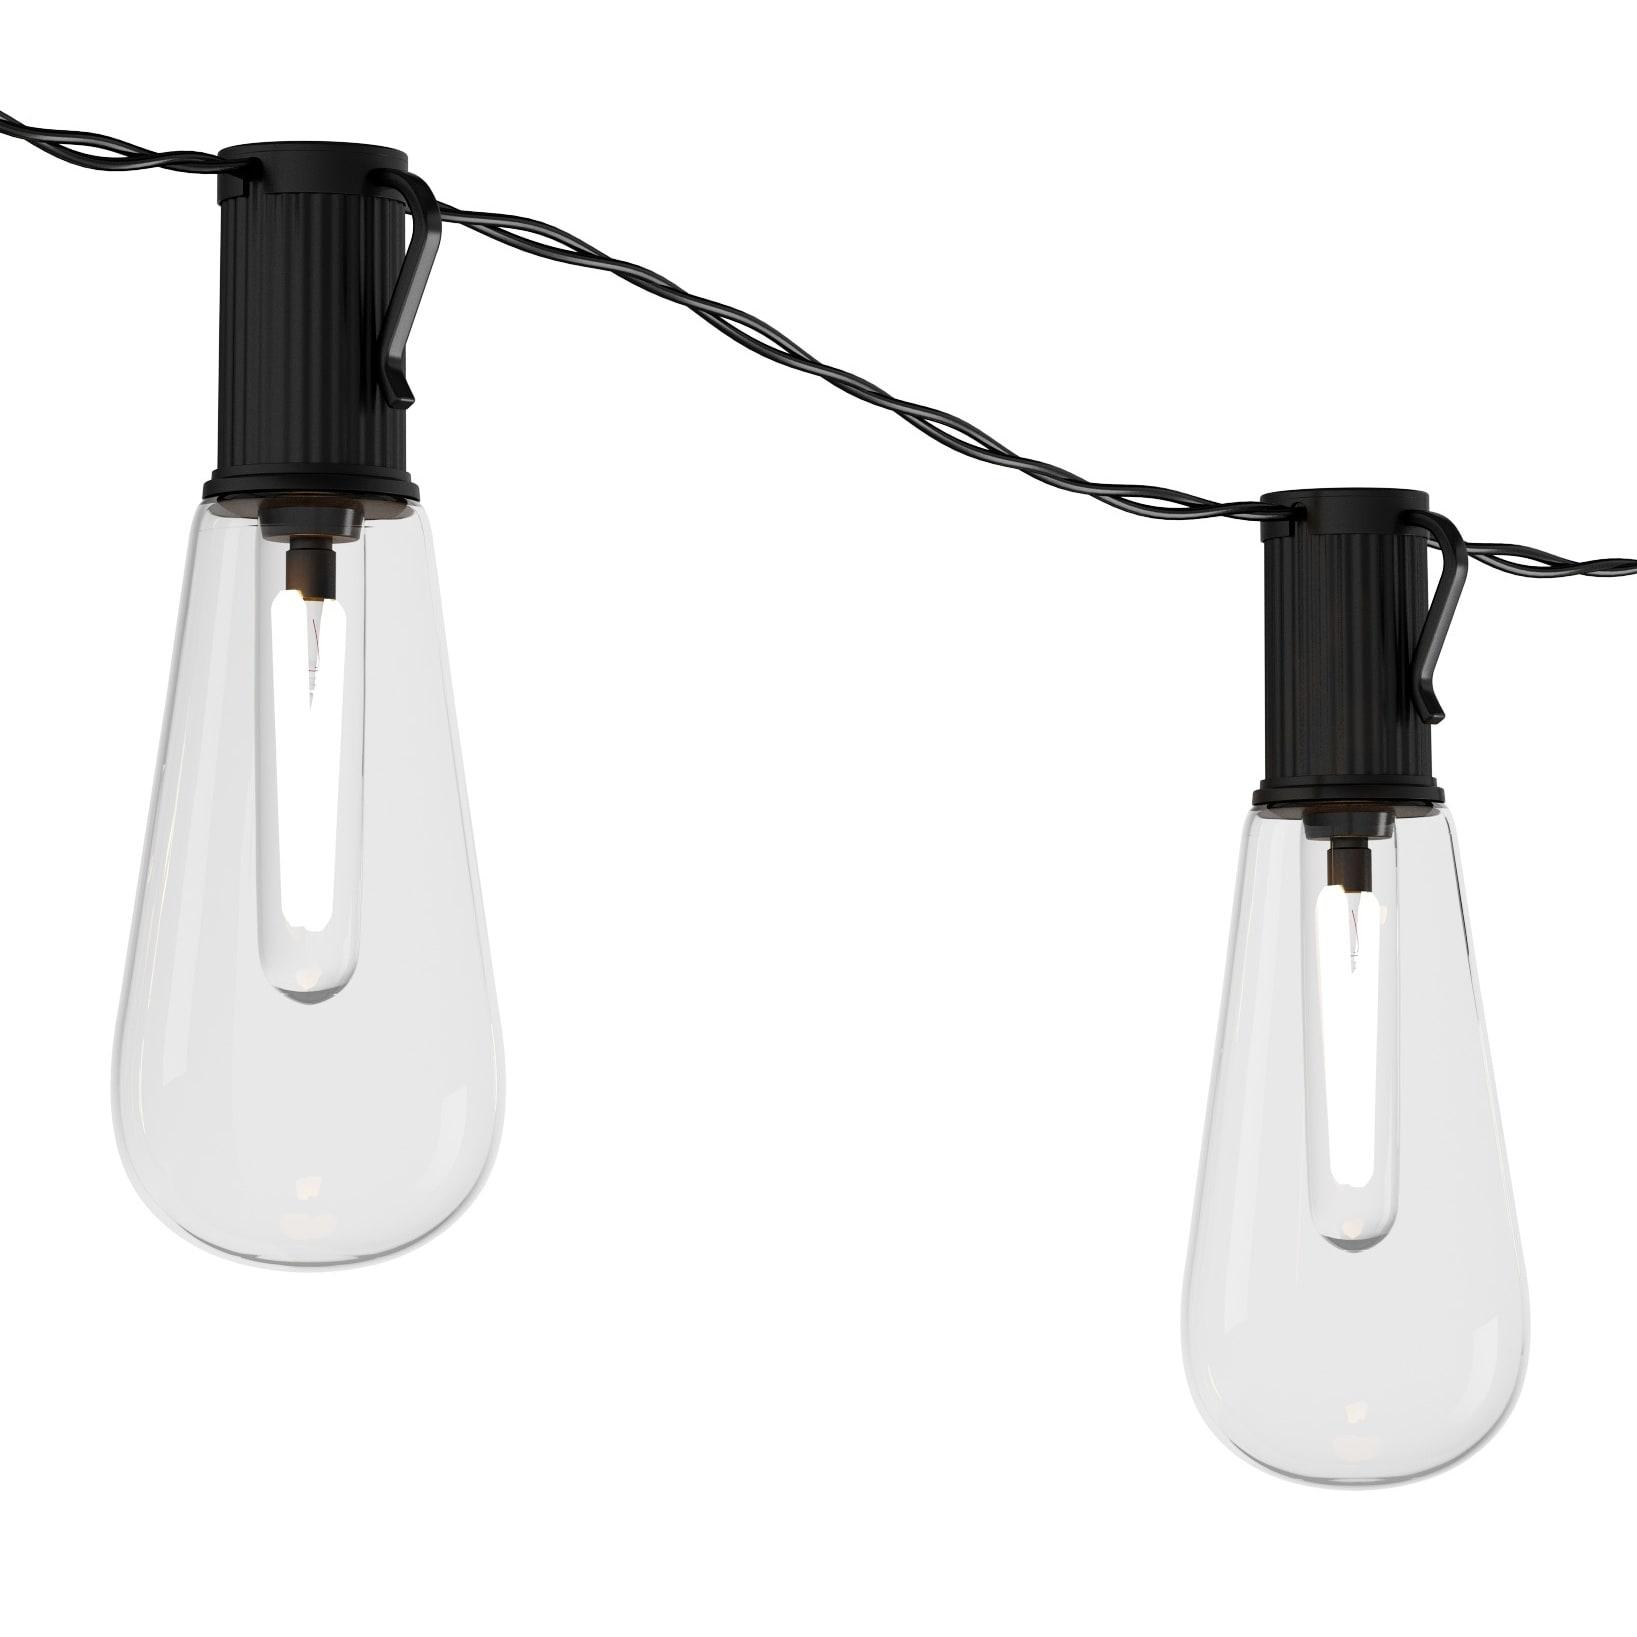 Outdoor Solar String Lights Vintage Style Bulbs Pure Garden On Sale Overstock 23556583